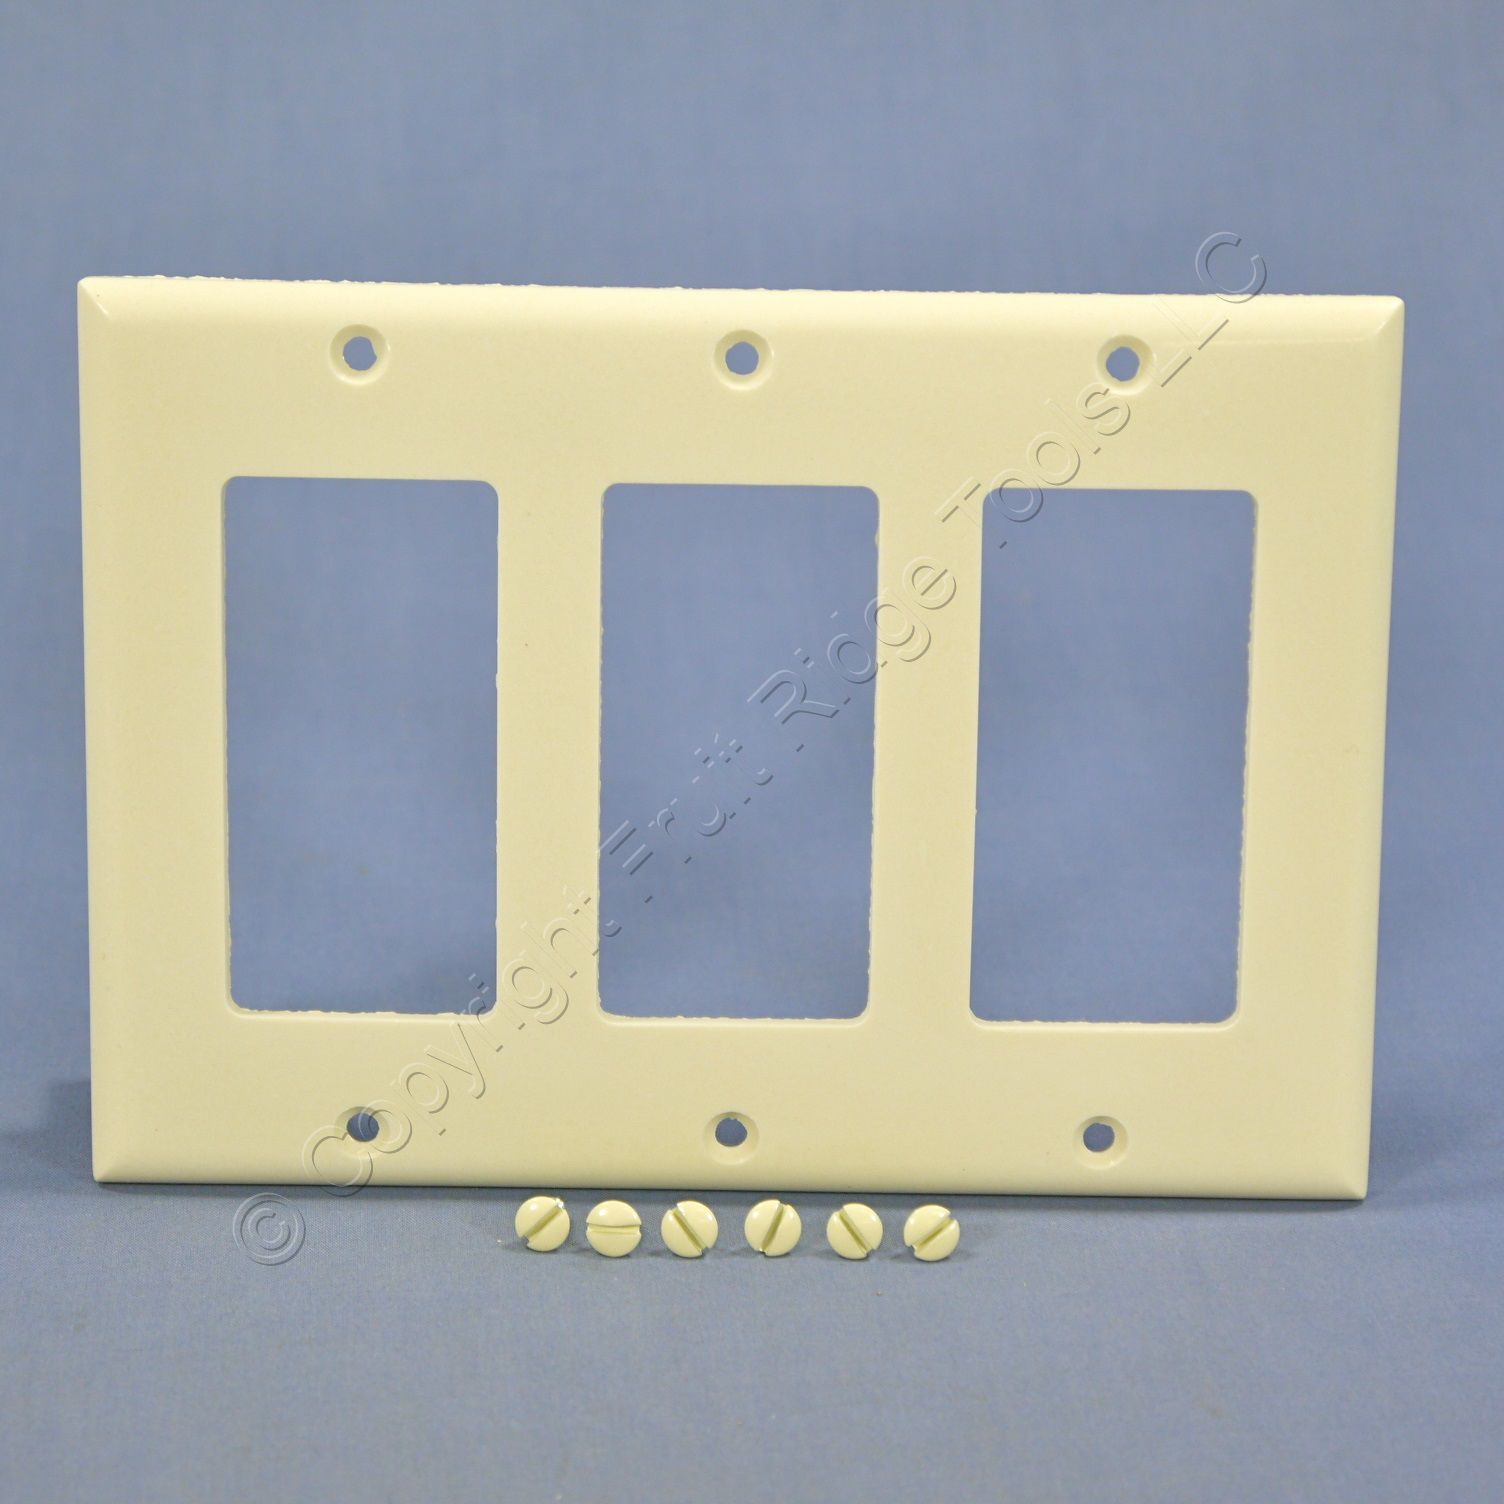 Cooper Almond Standard Decorator 3-Gang Thermoset Wallplate GFCI GFI ...